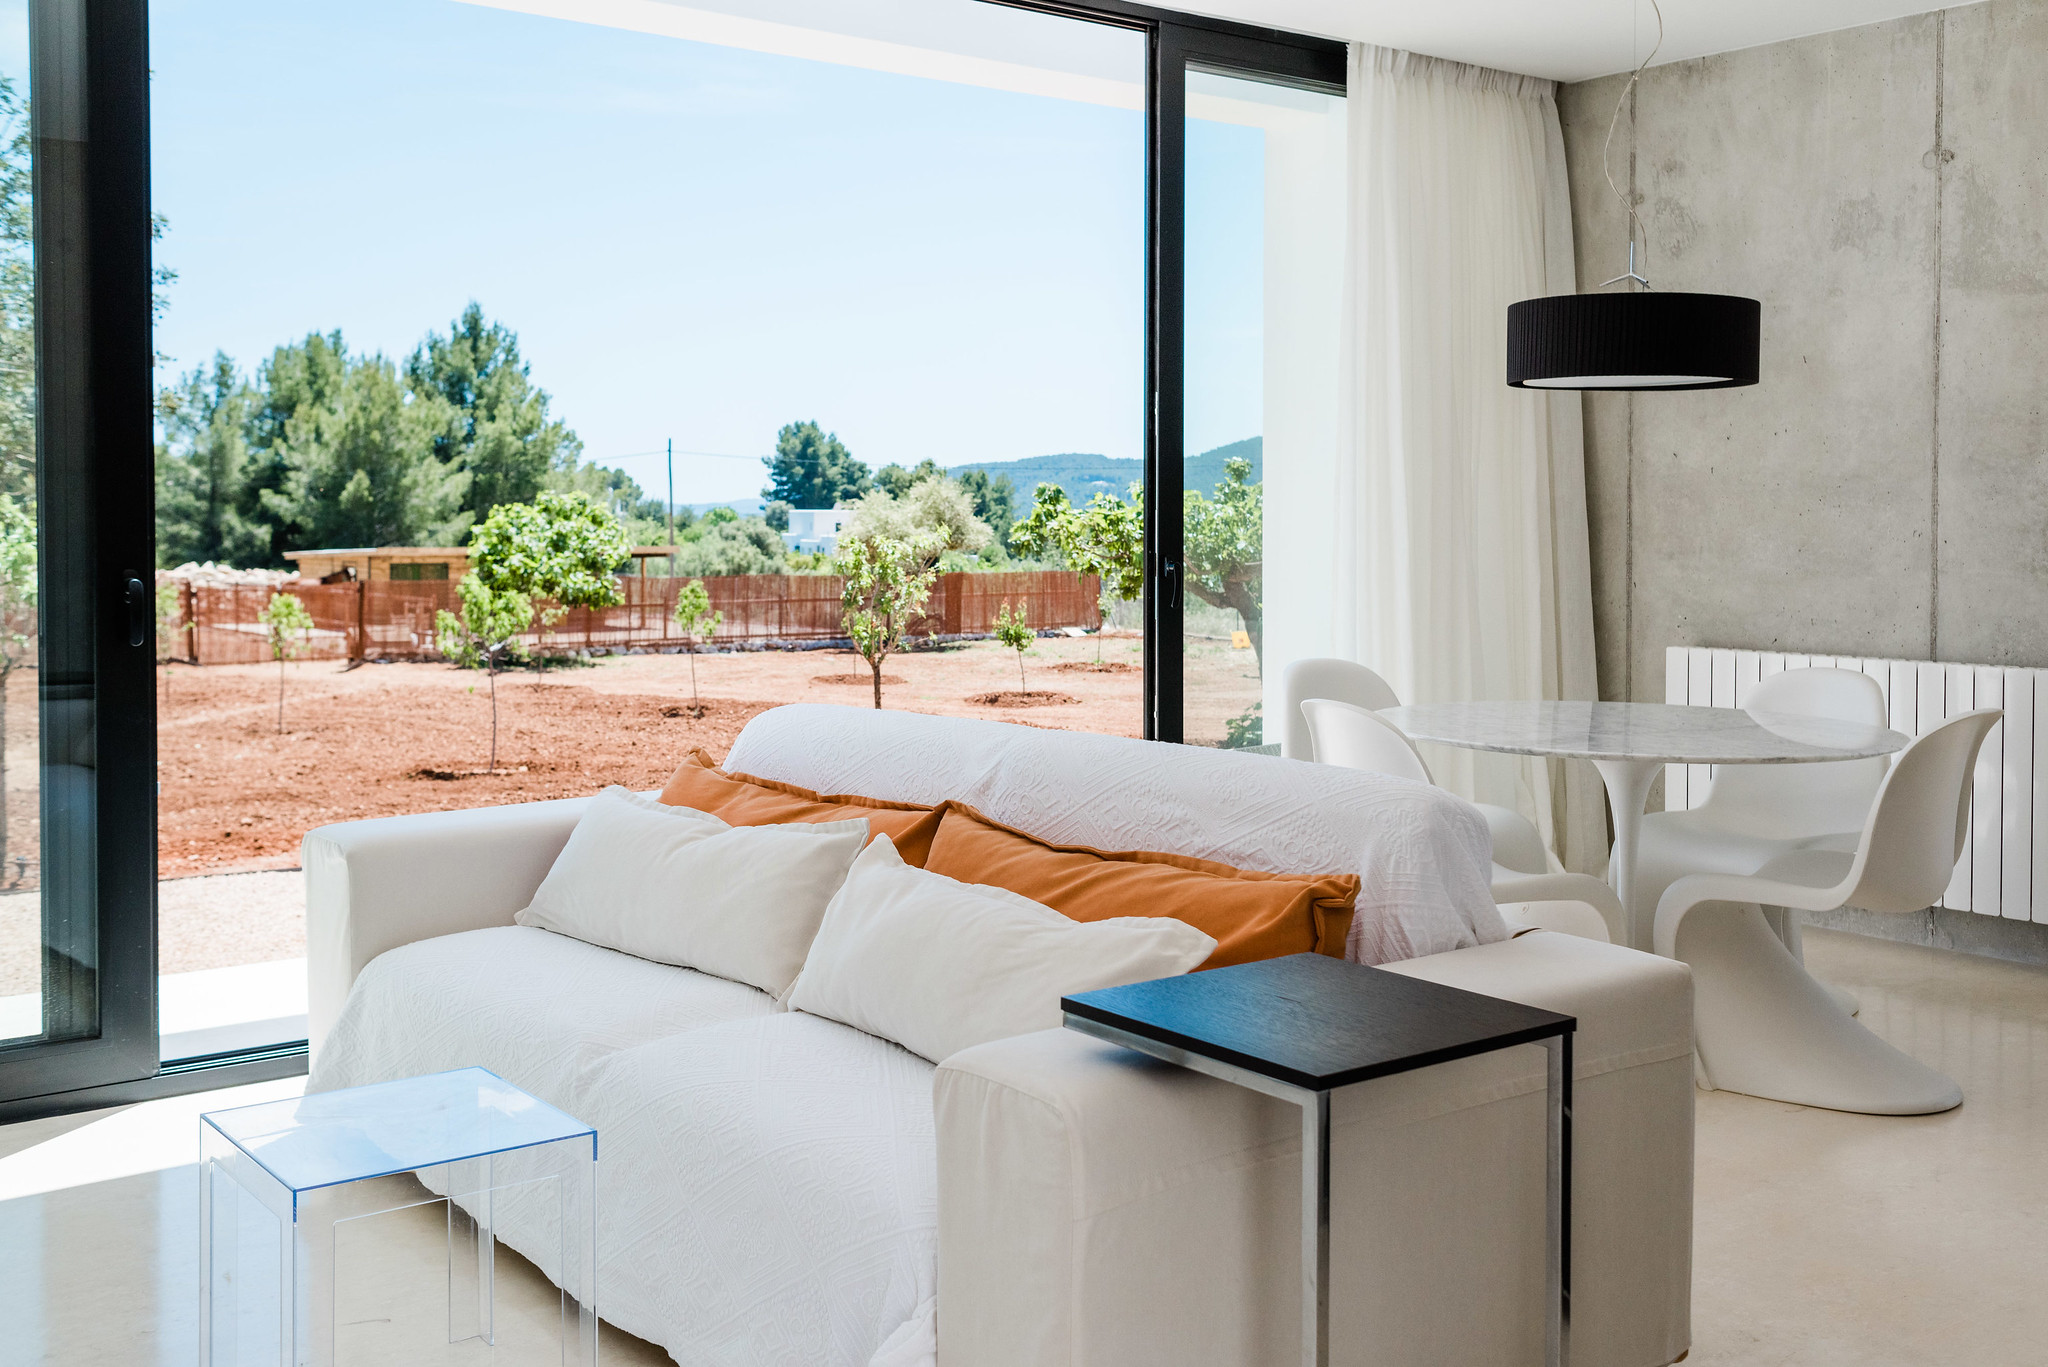 https://www.white-ibiza.com/wp-content/uploads/2020/06/white-ibiza-villas-can-carmen-interior-living-space1.jpg